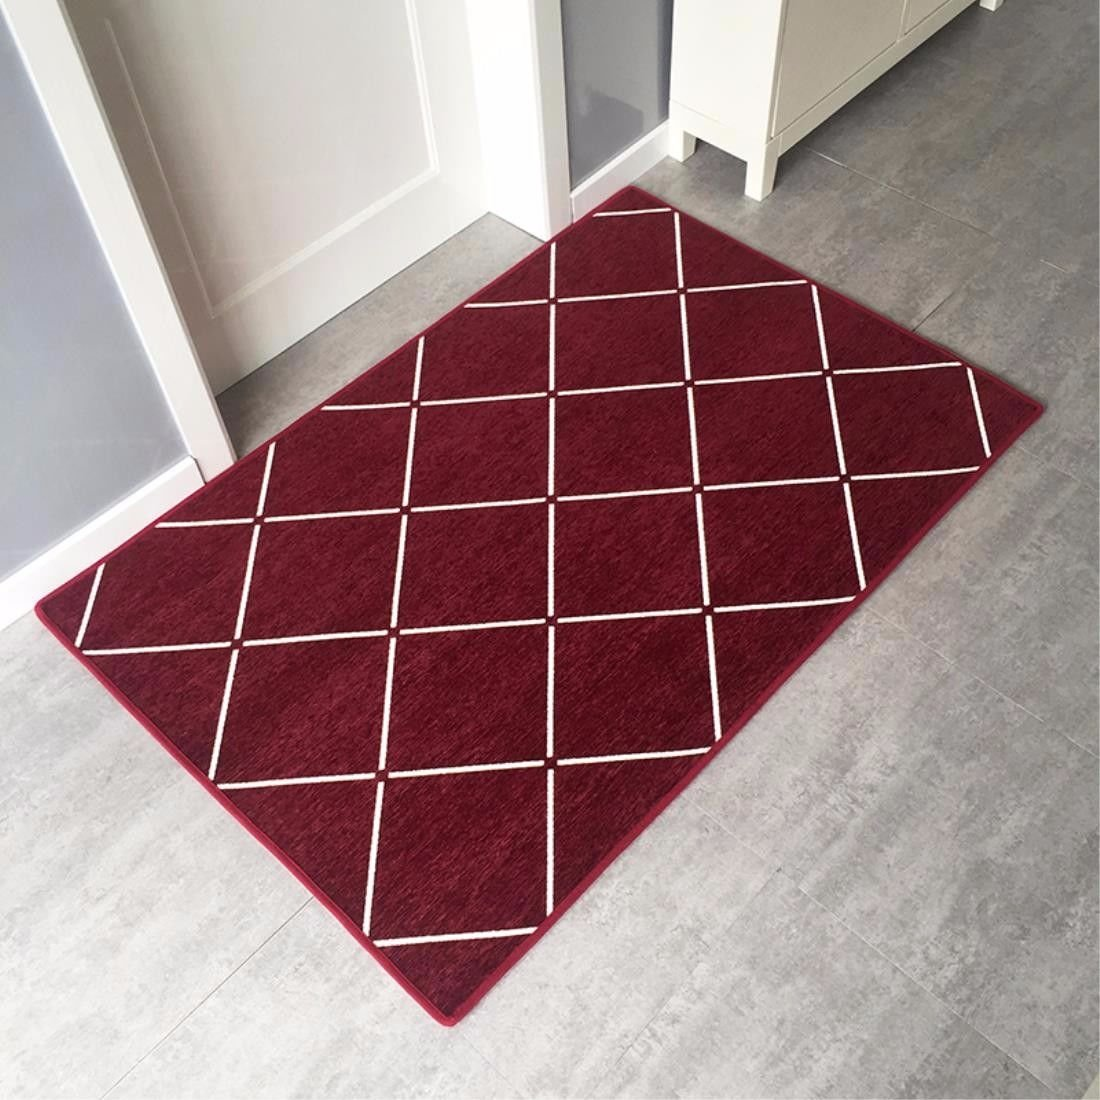 LIUXINDA-DT Modern household carpet, doorway carpet, antiskid carpet, living room carpet, corridor carpet,60 X 90CM(23.6 X 35.4'')